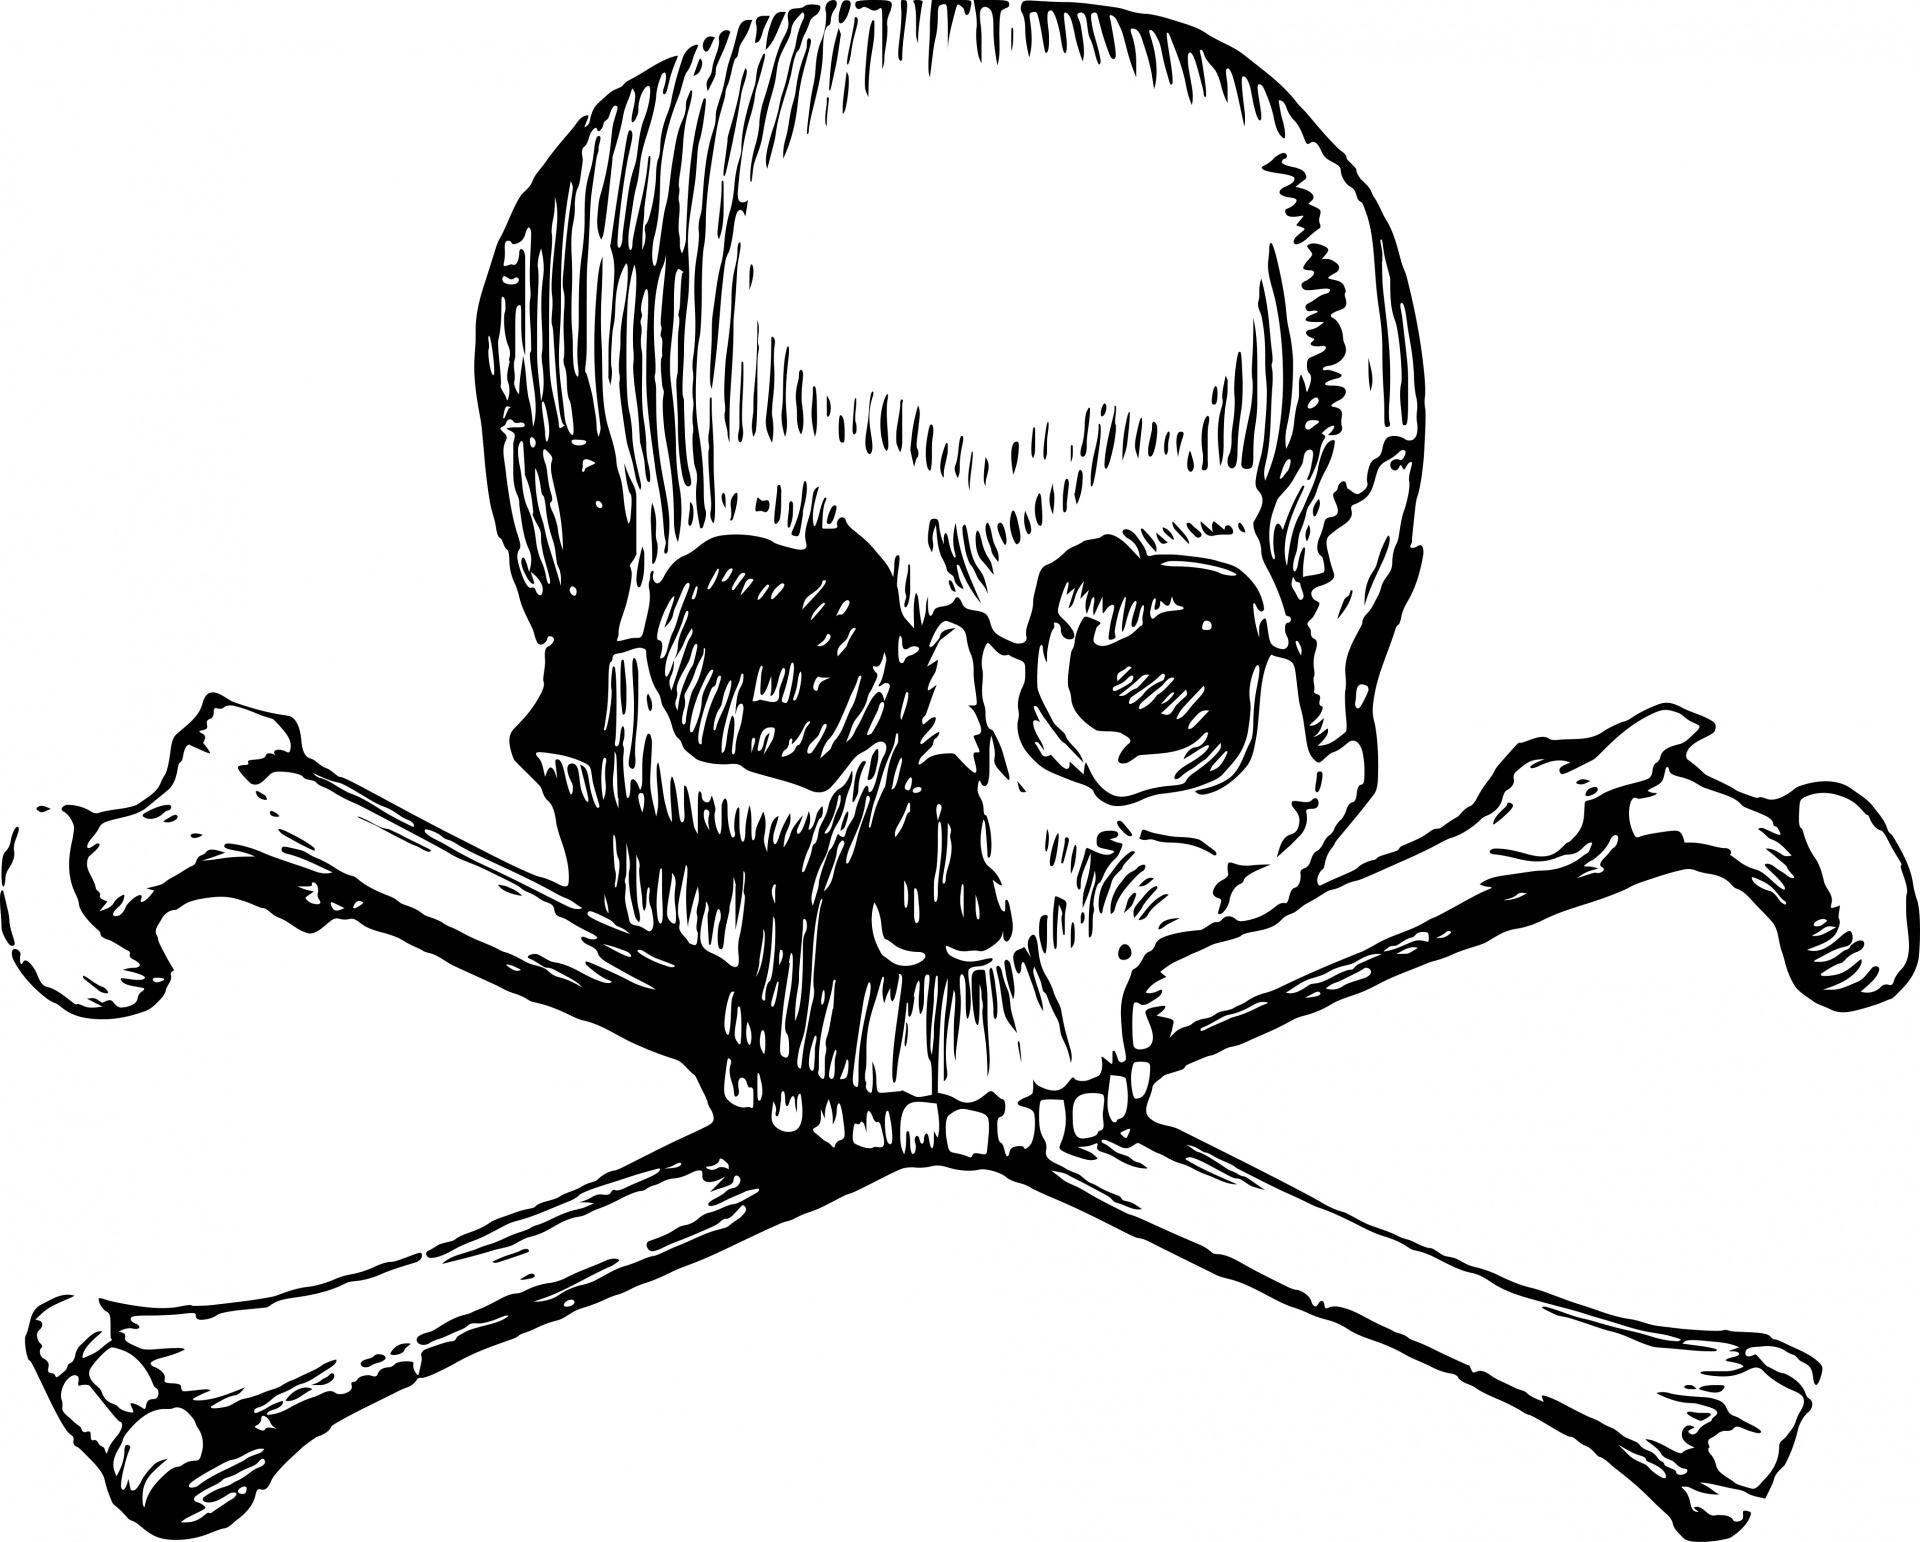 Skull And Crossbones Free Stock Photo